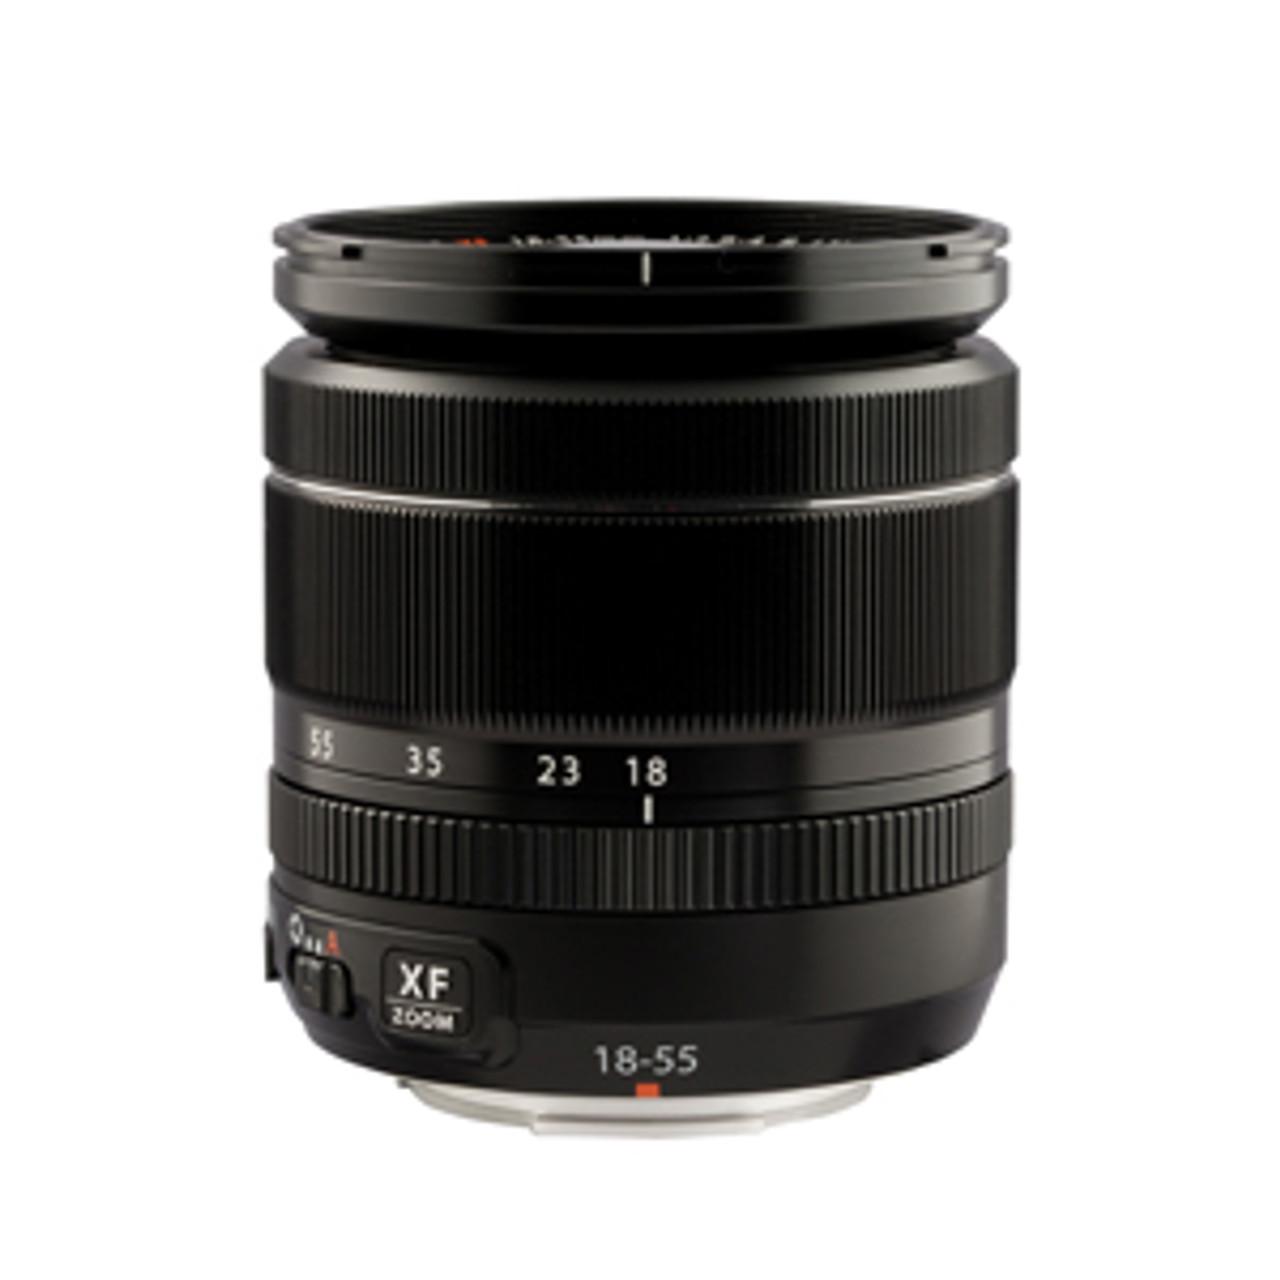 Fujifilm Fujinon XF 18-55mm F2.8-4 R Lens